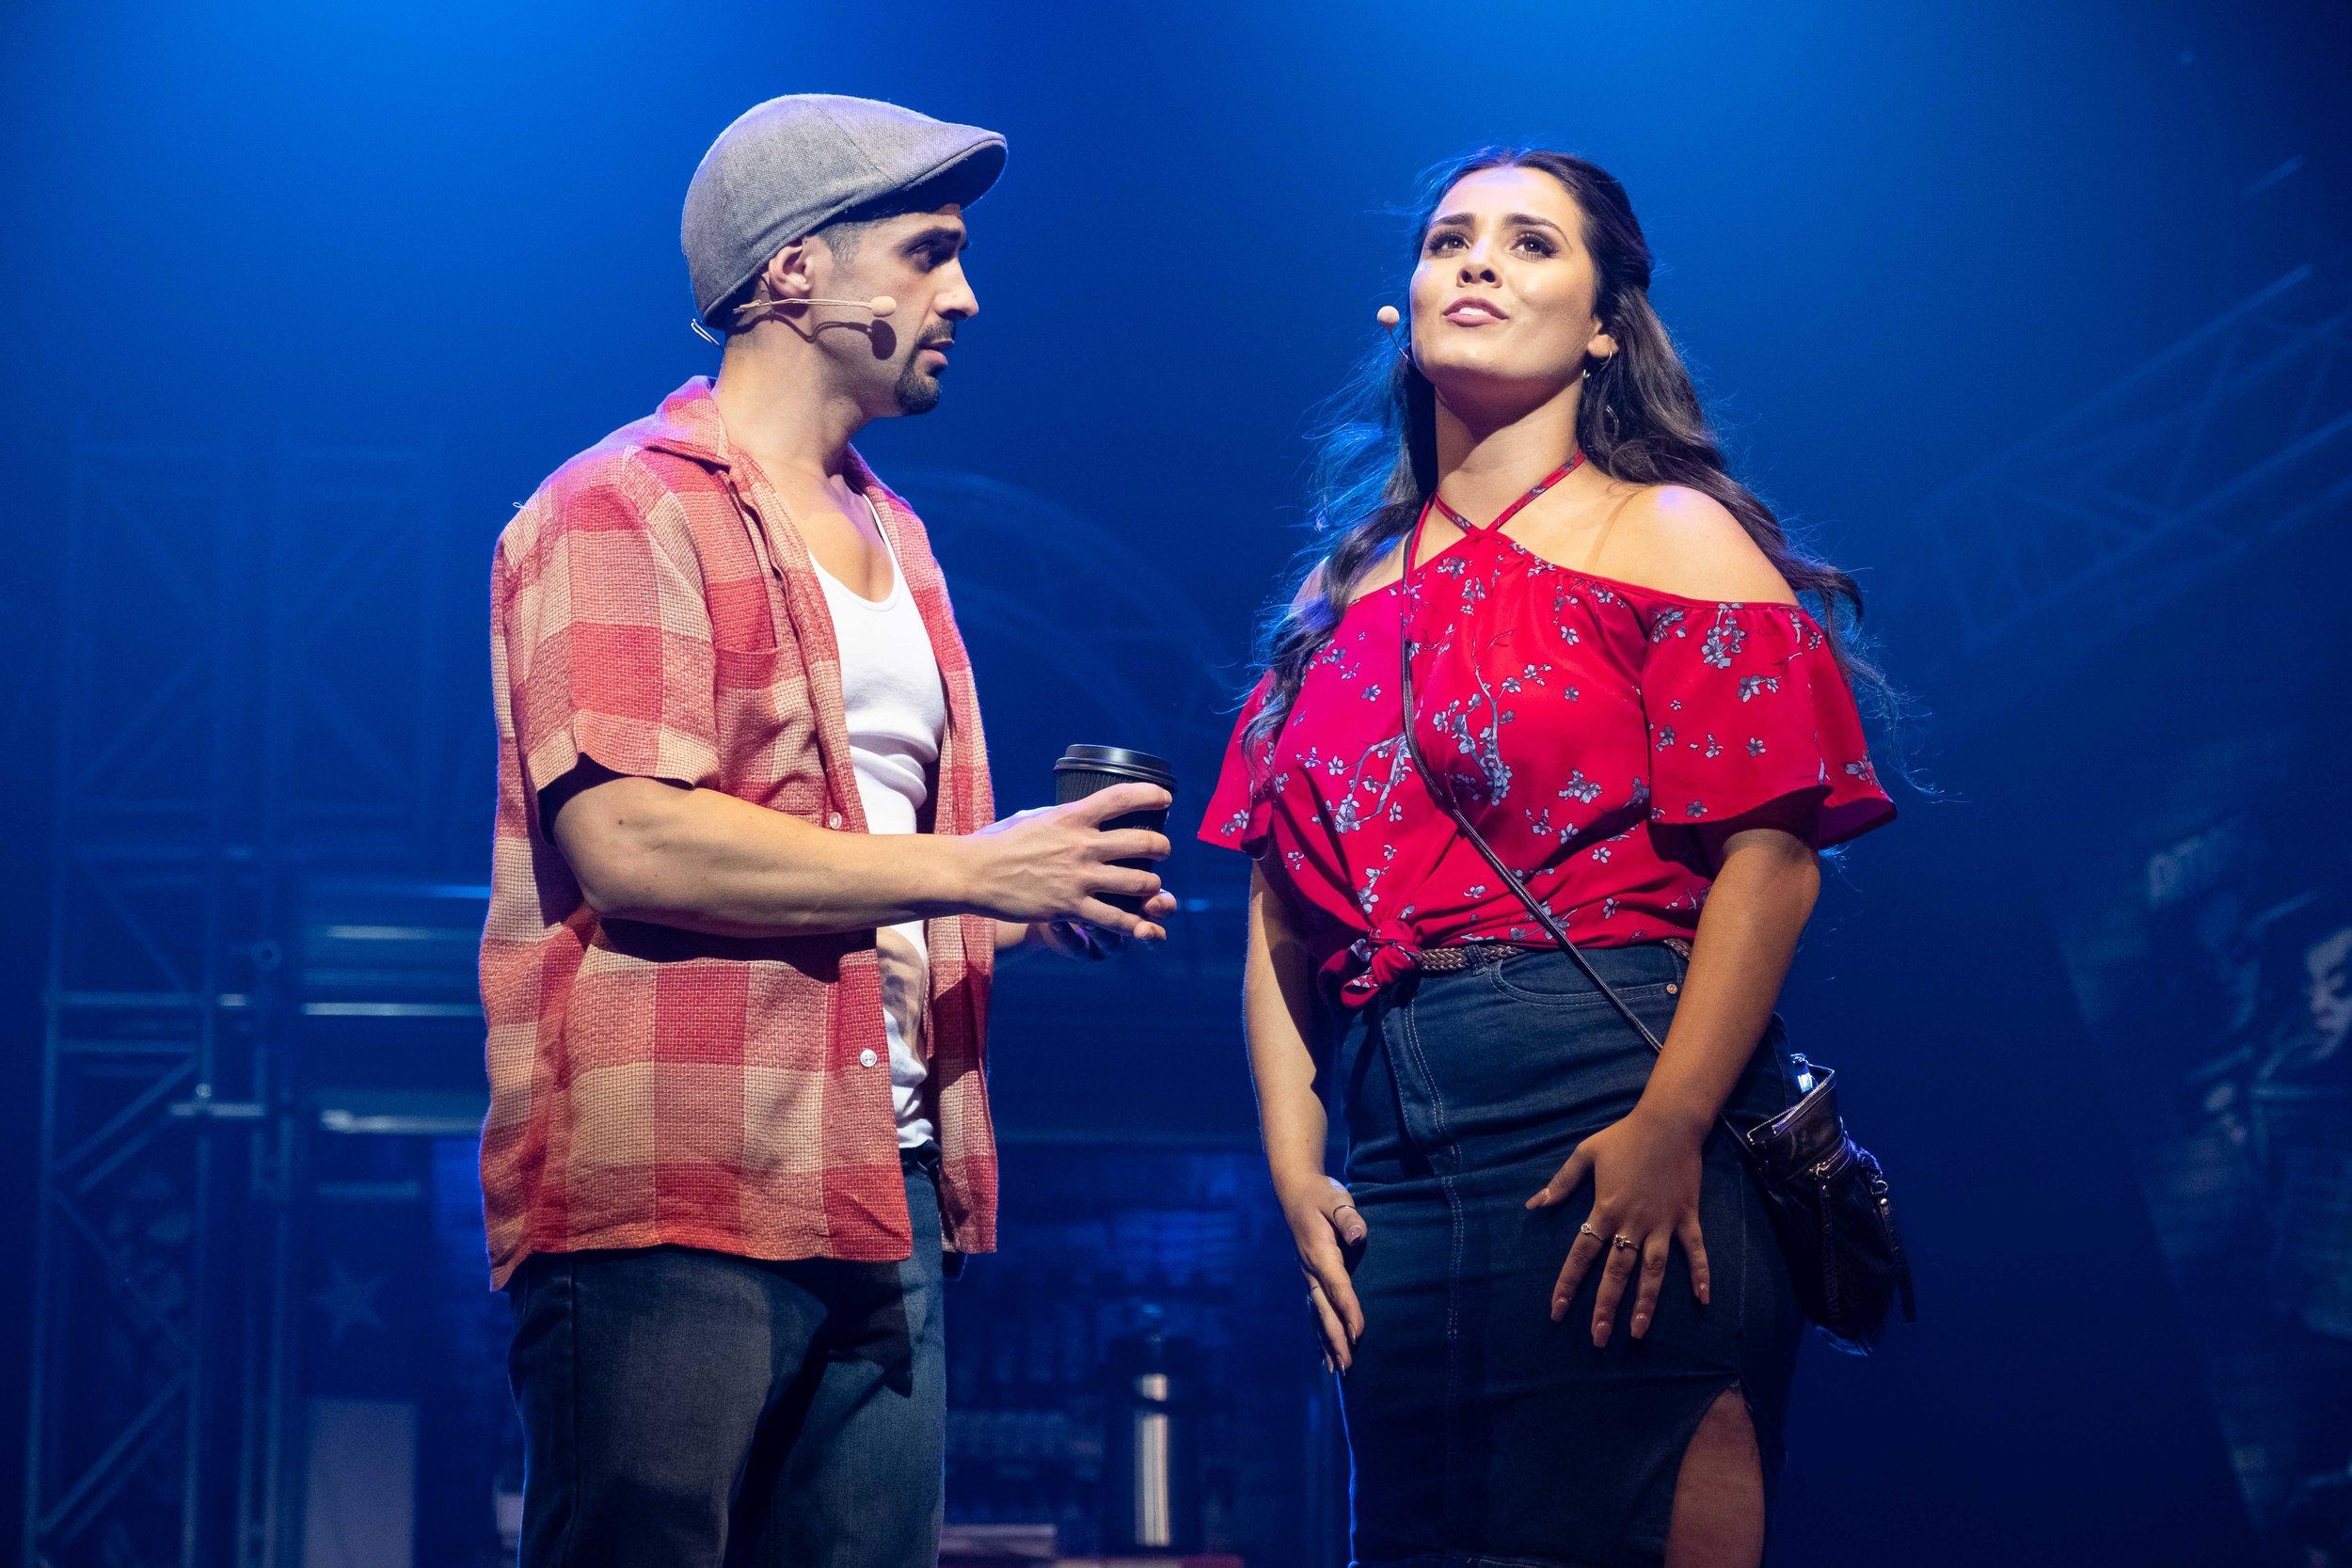 Steven Lopez, Olivia Vasquez InTheHeights_SOH_clarehawley-2.jpg